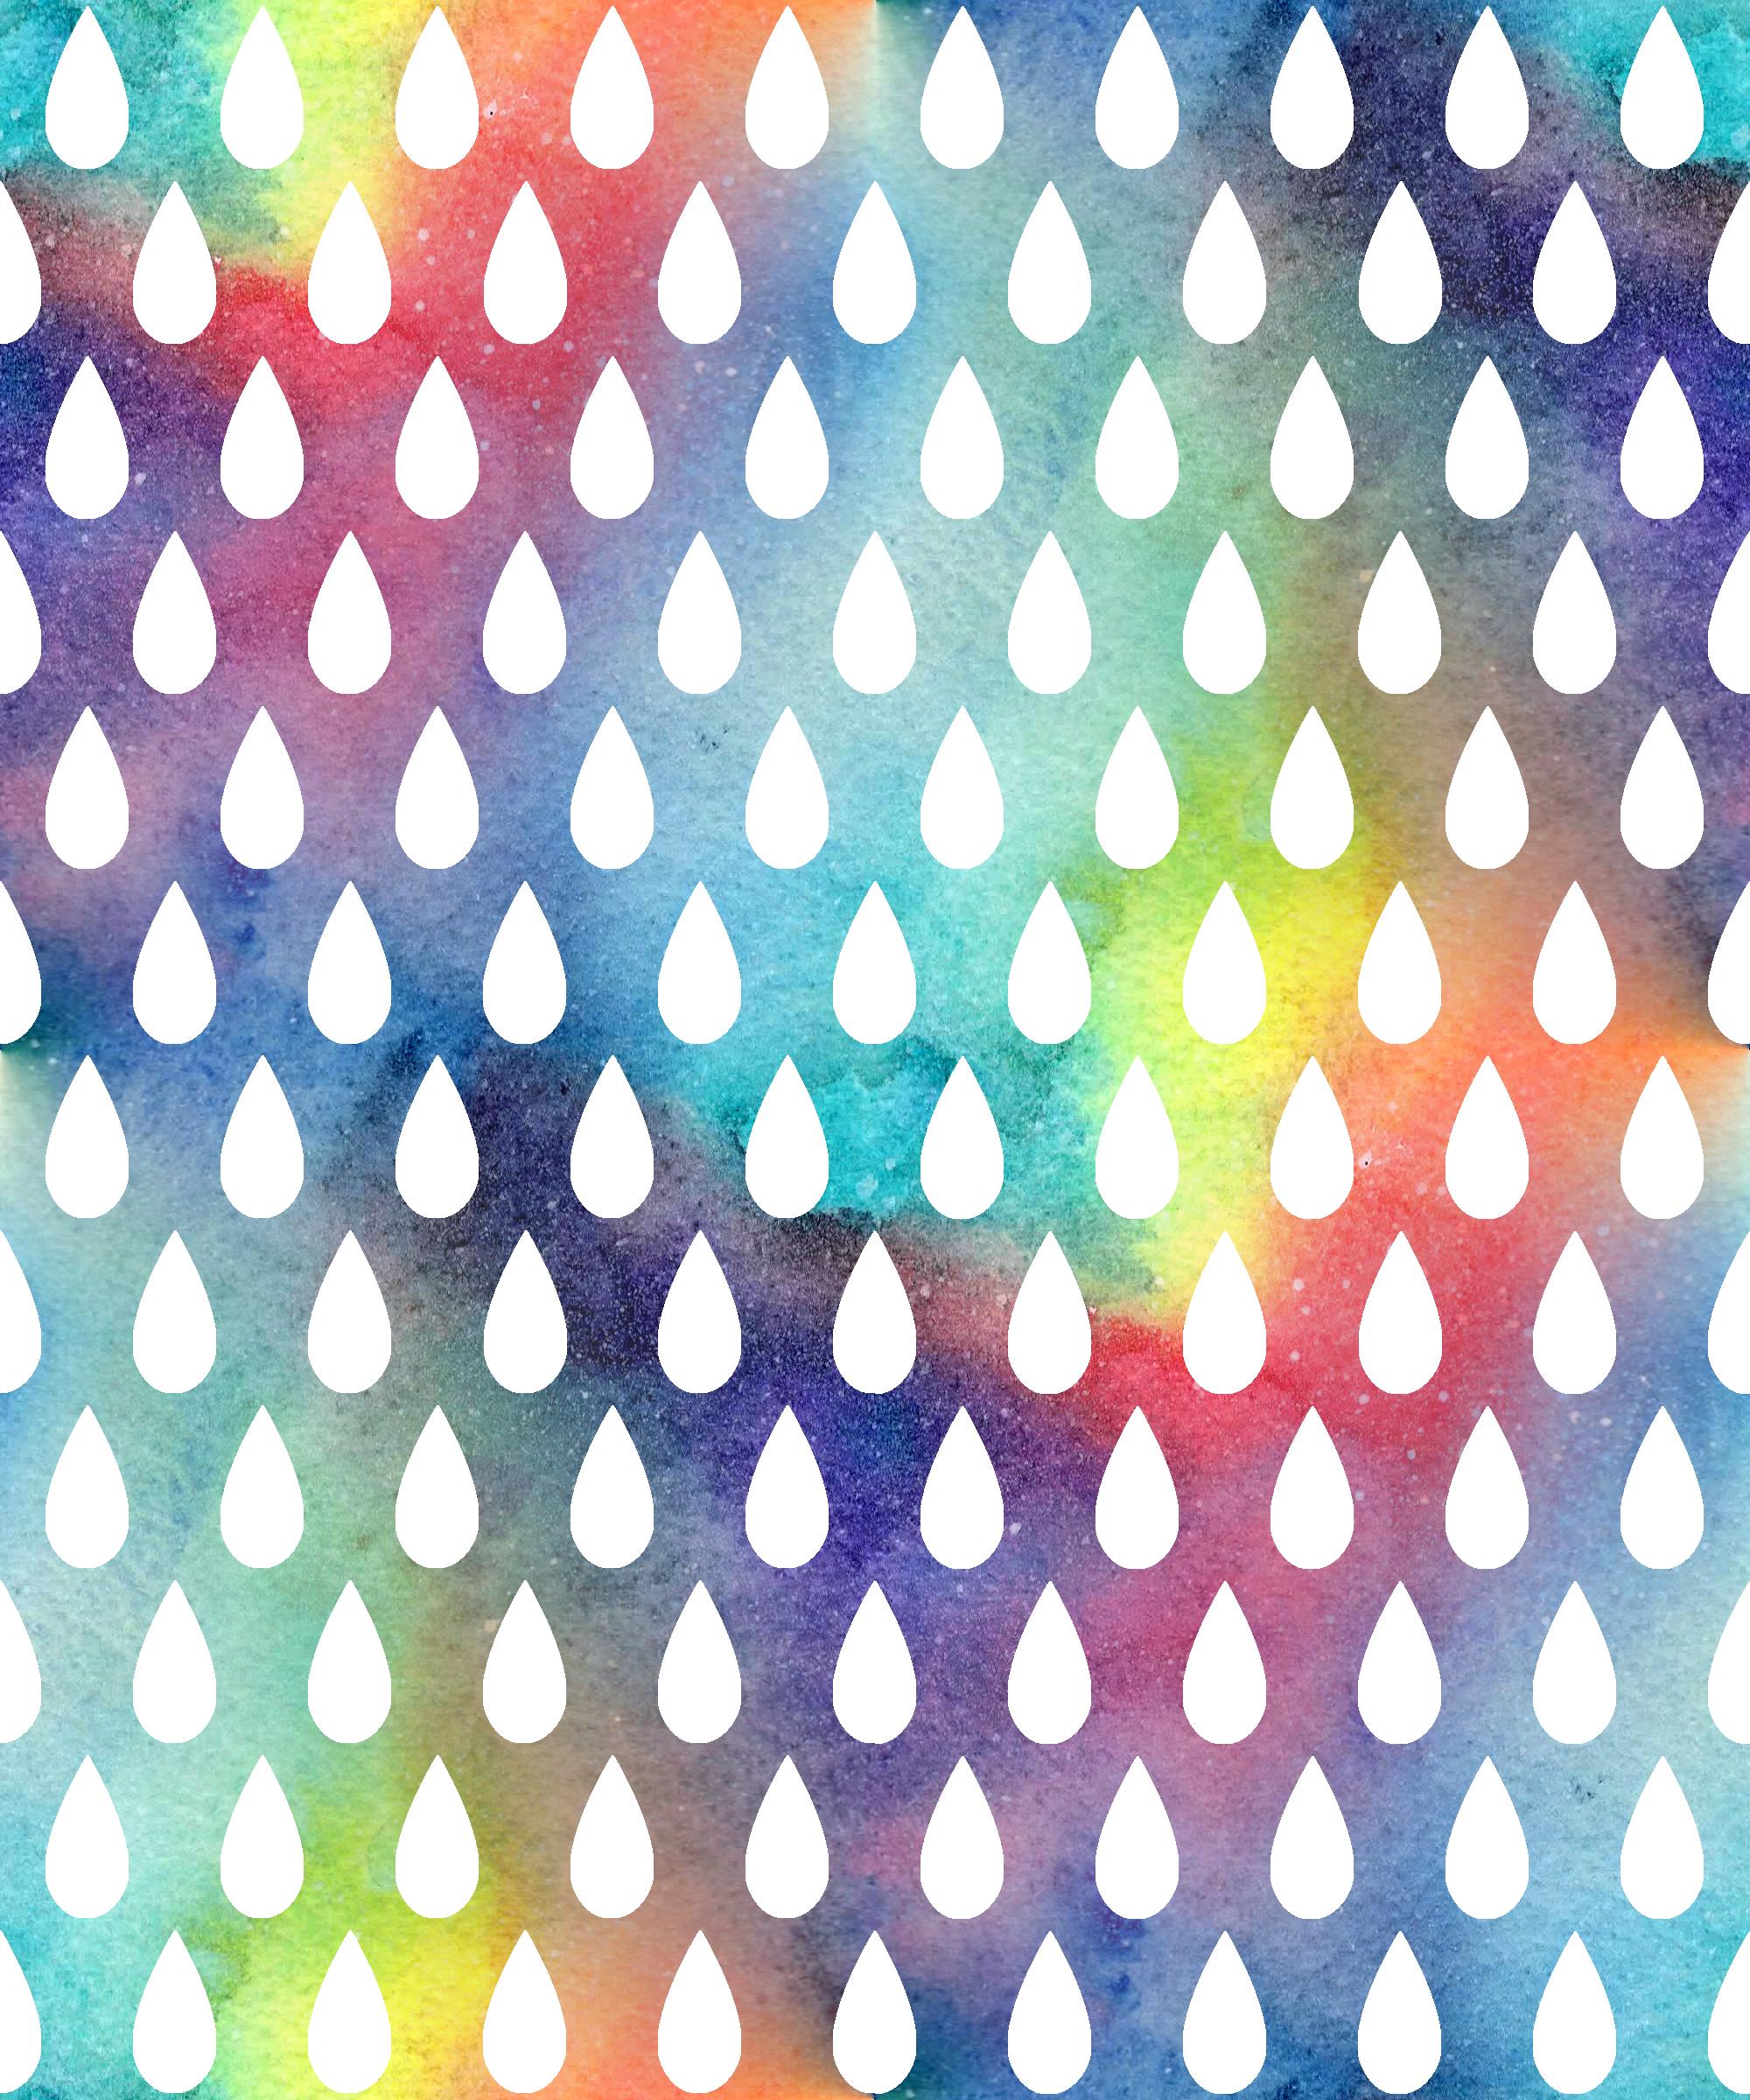 raindrop white on pastel raindrop.png